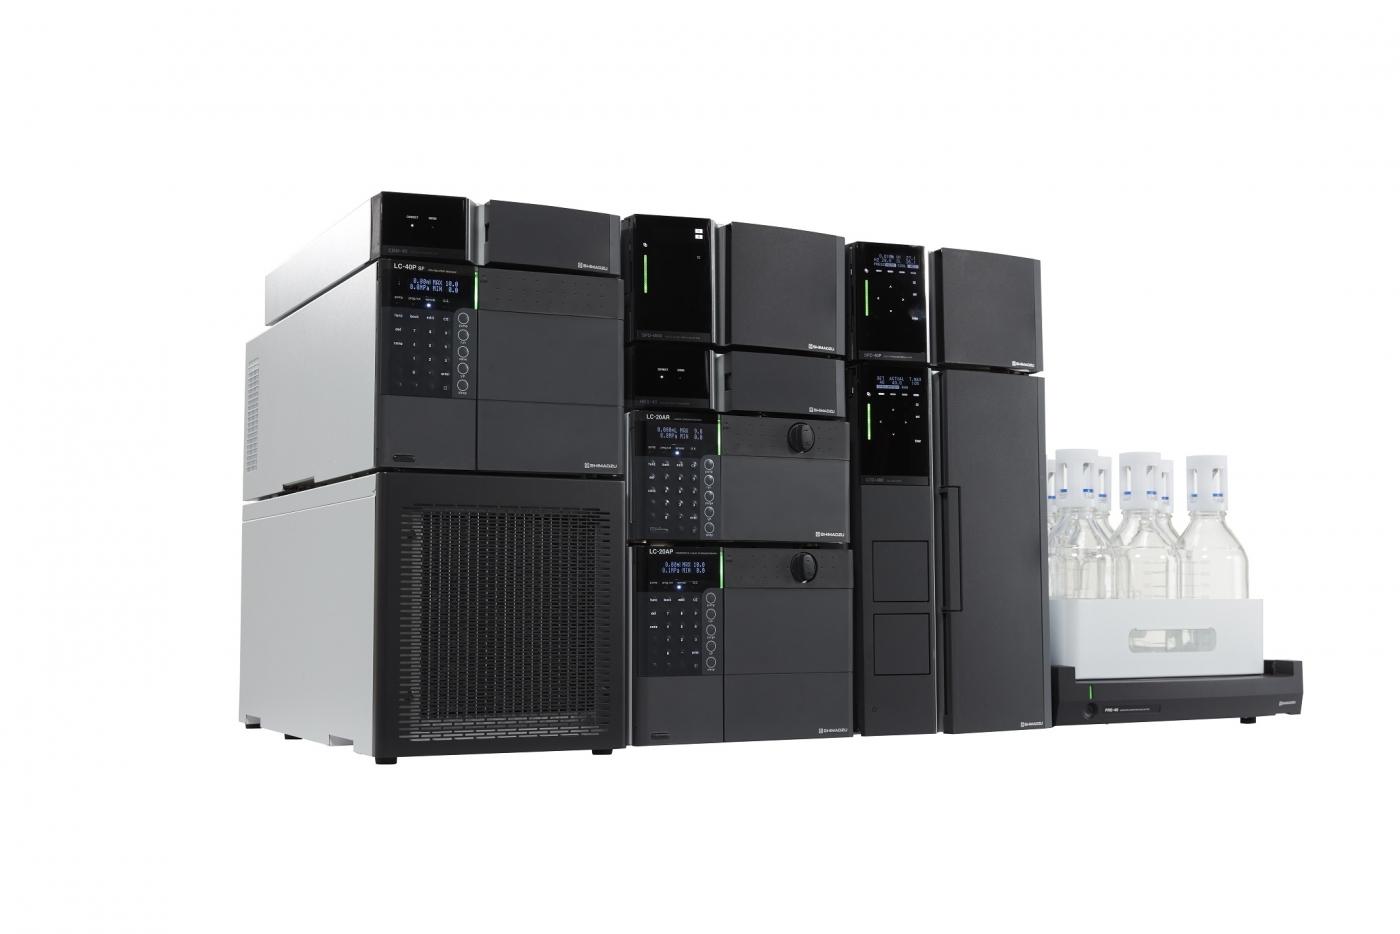 Shimadzu Introduces Nexera Preparative SFC System